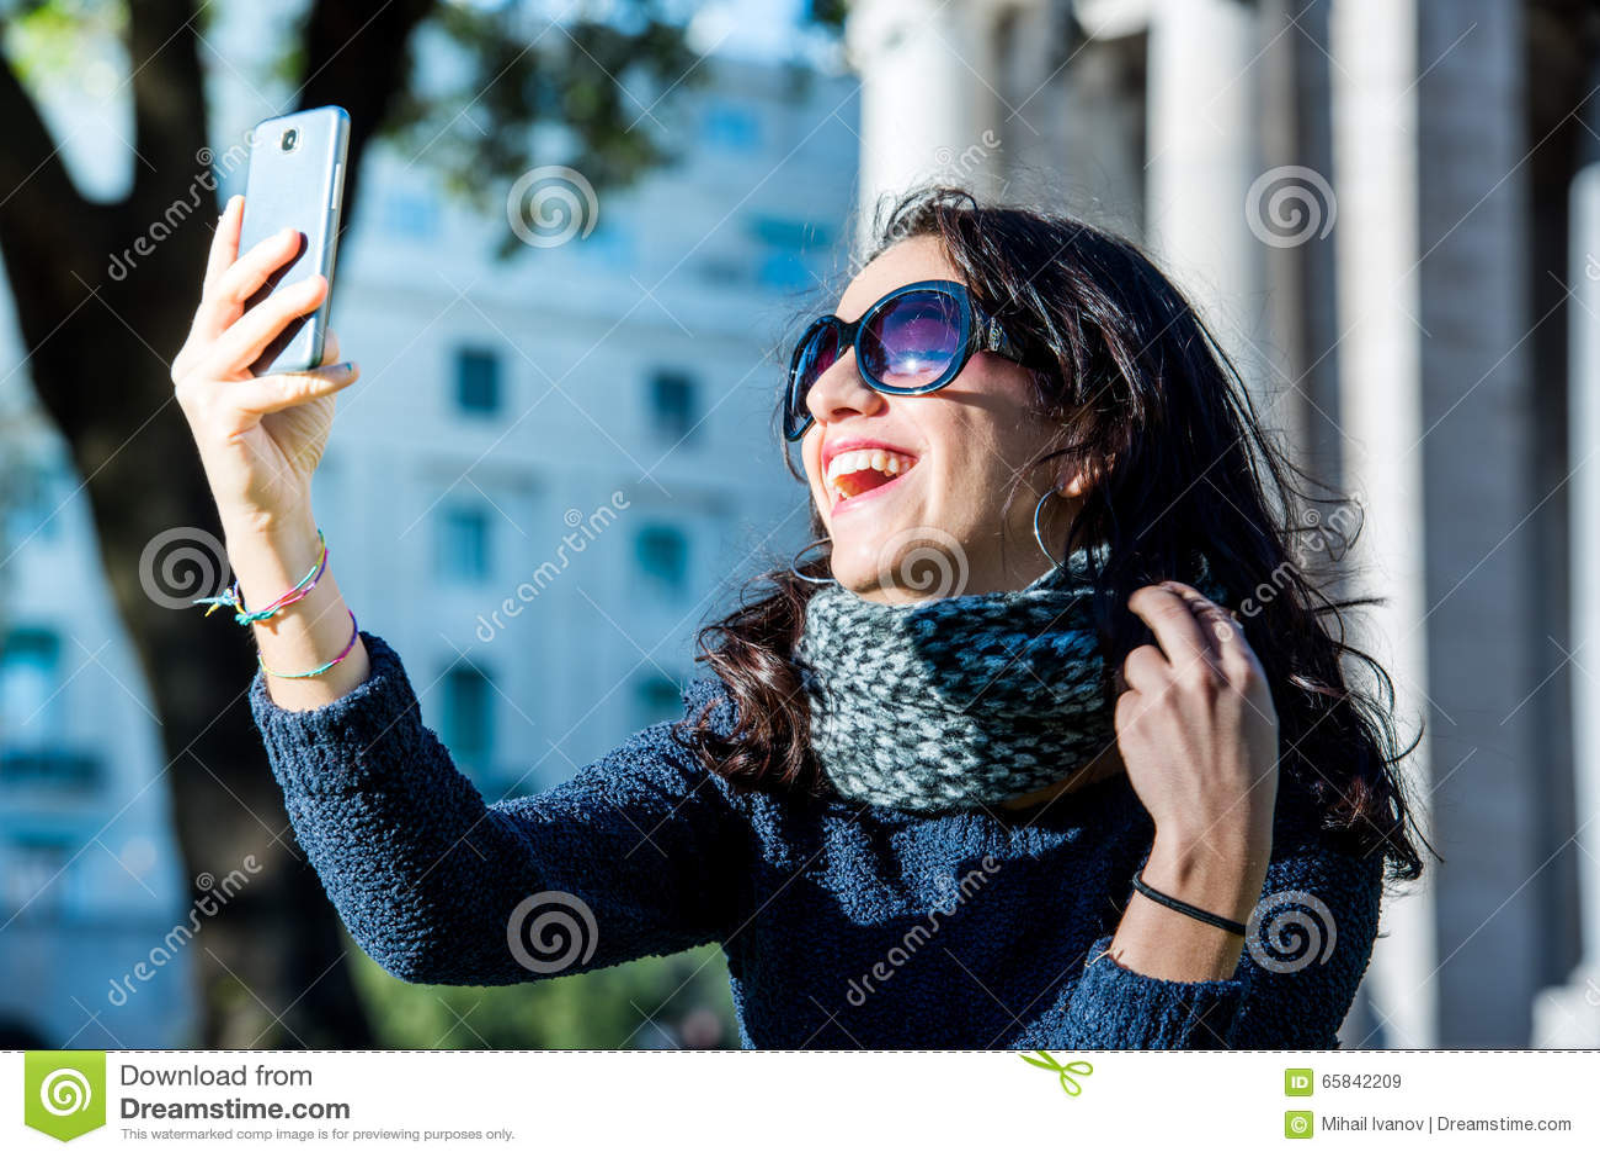 Beautiful teenage girl with dark hair and sun glasses taking selfies and laughting - close shot